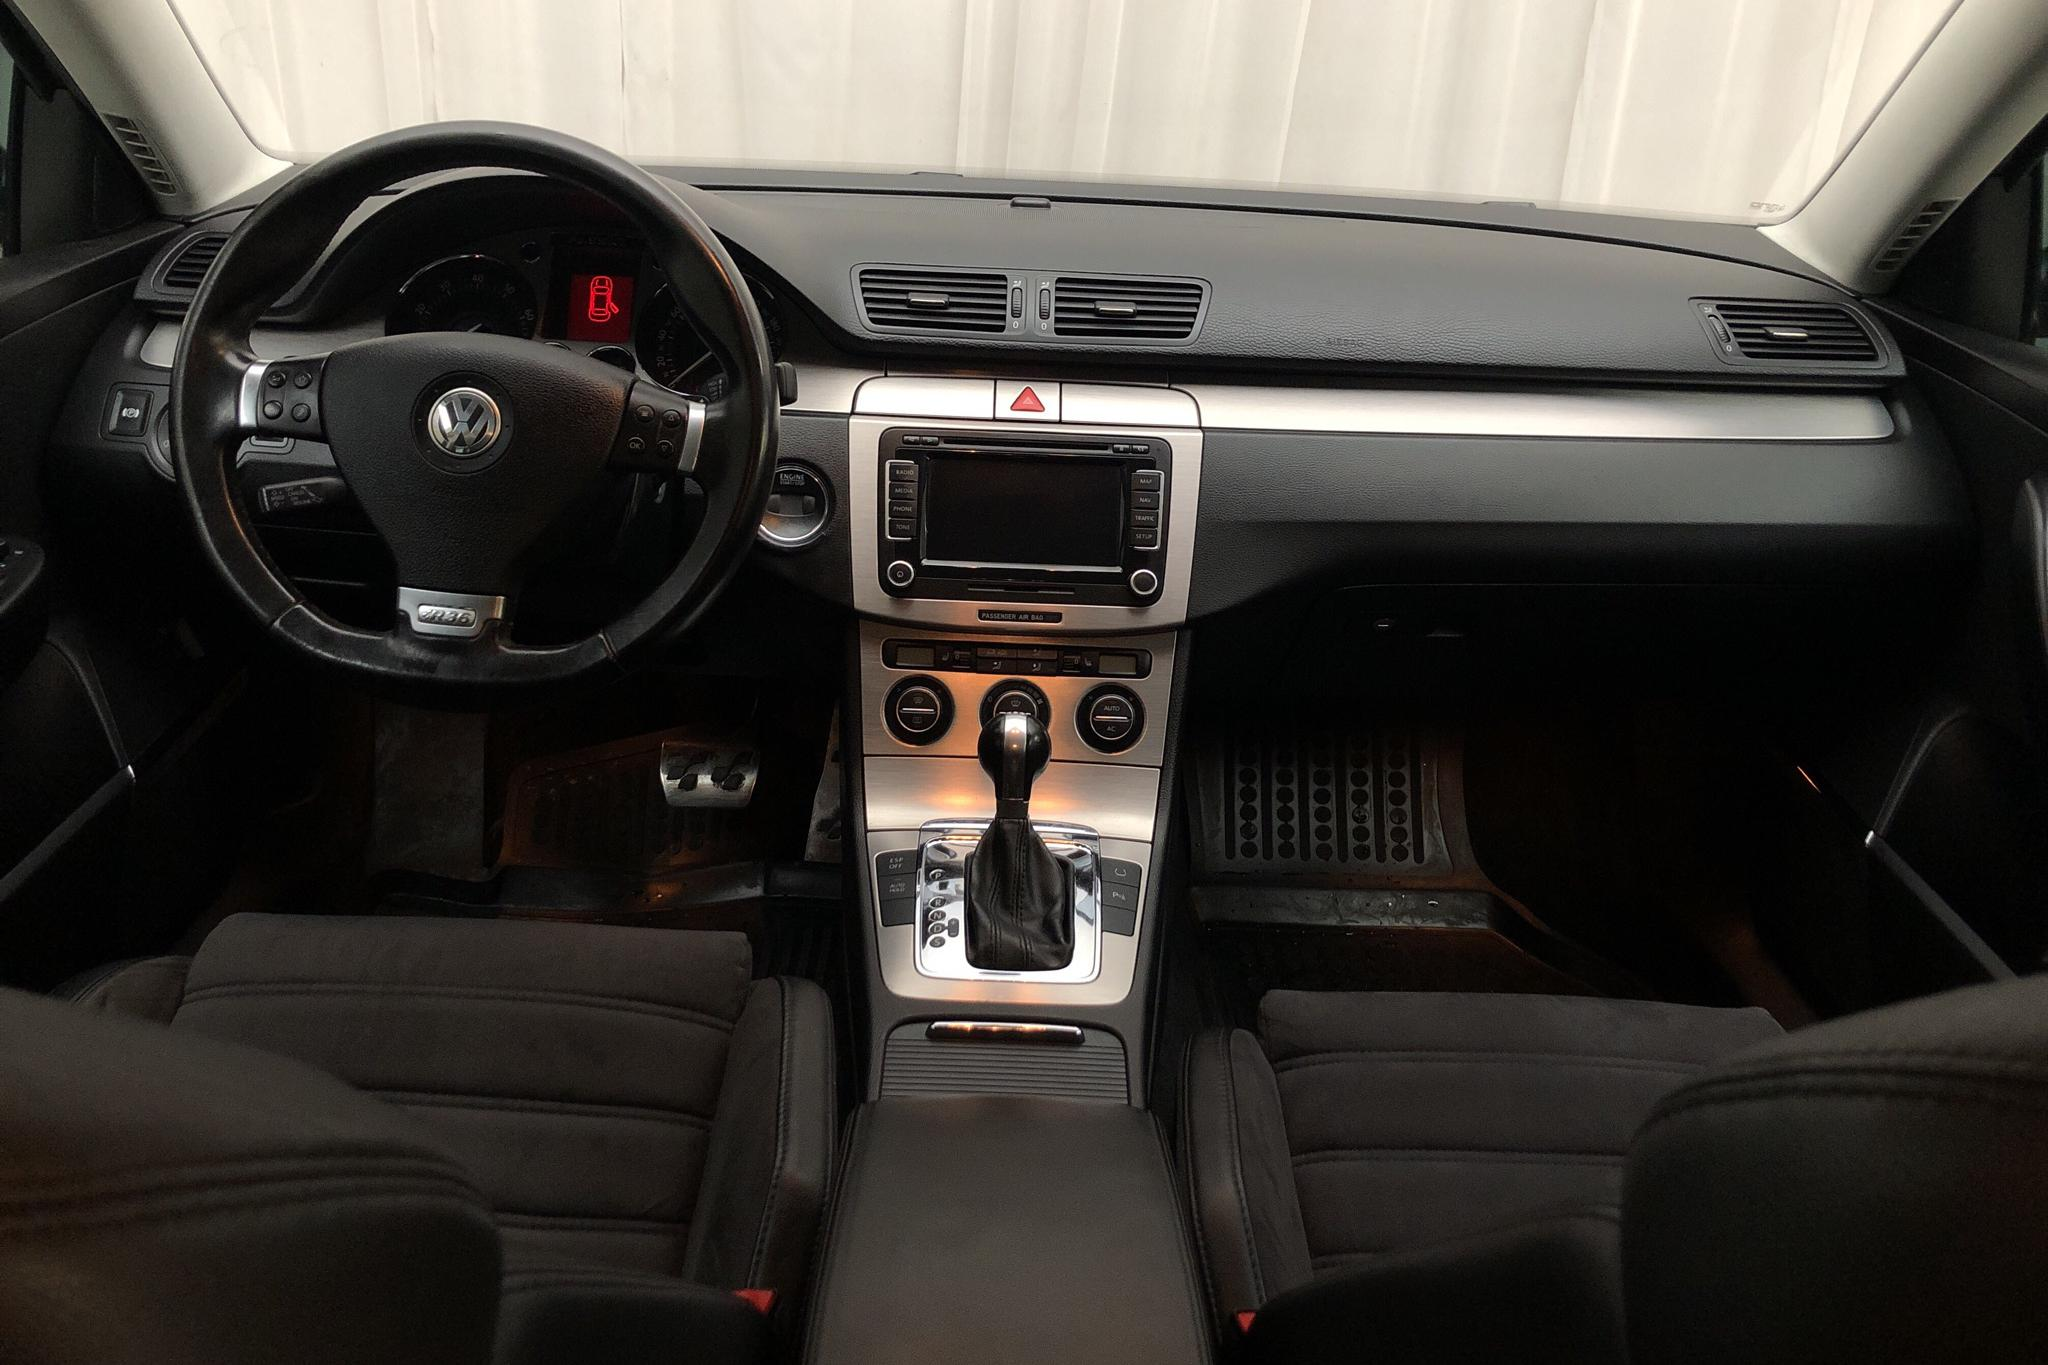 VW Passat R36 Variant (300hk) - 139 720 km - Automatic - black - 2008